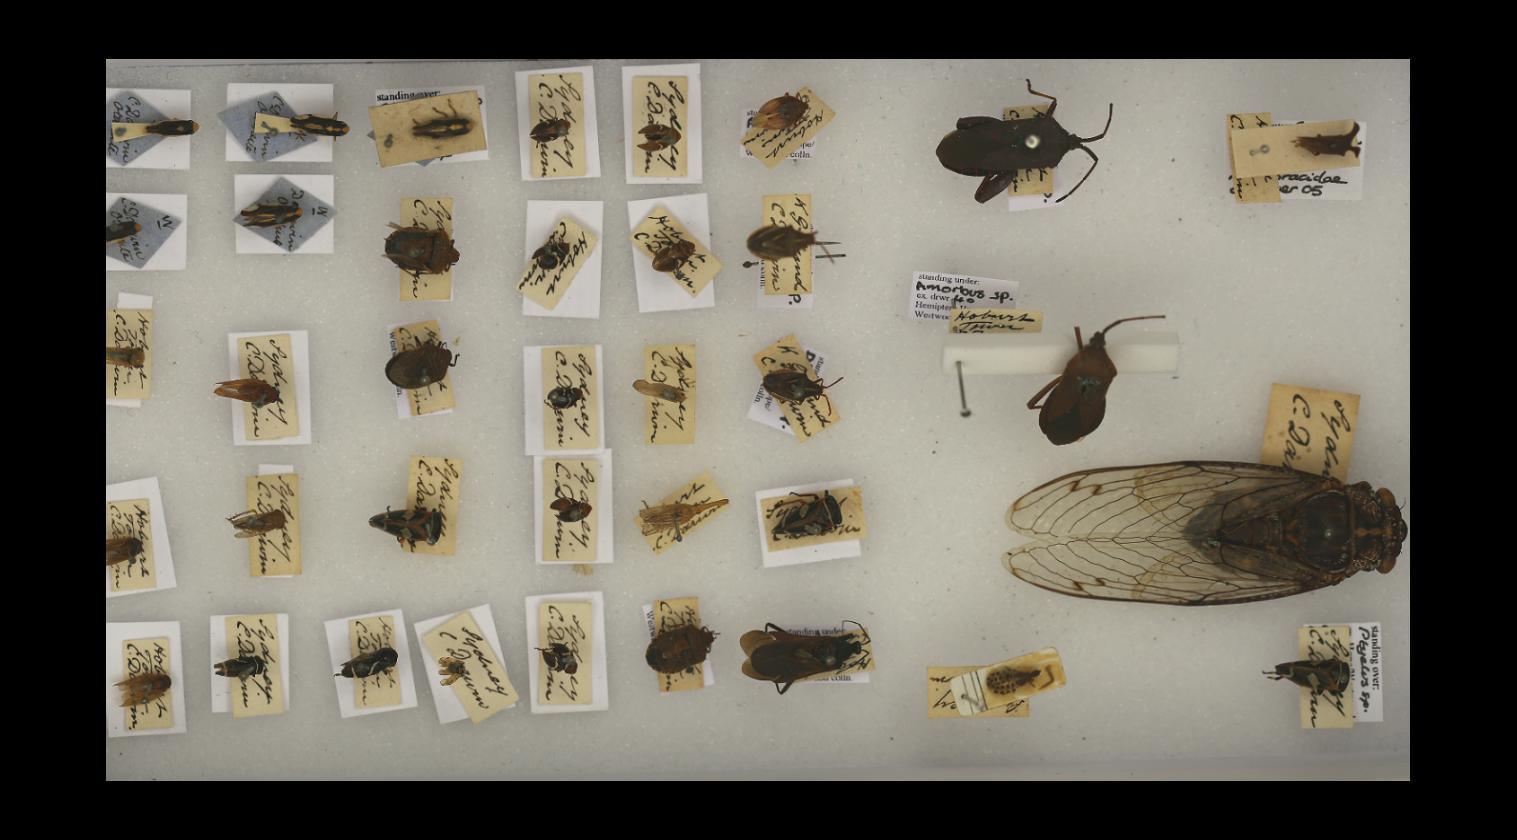 Darwins specimens